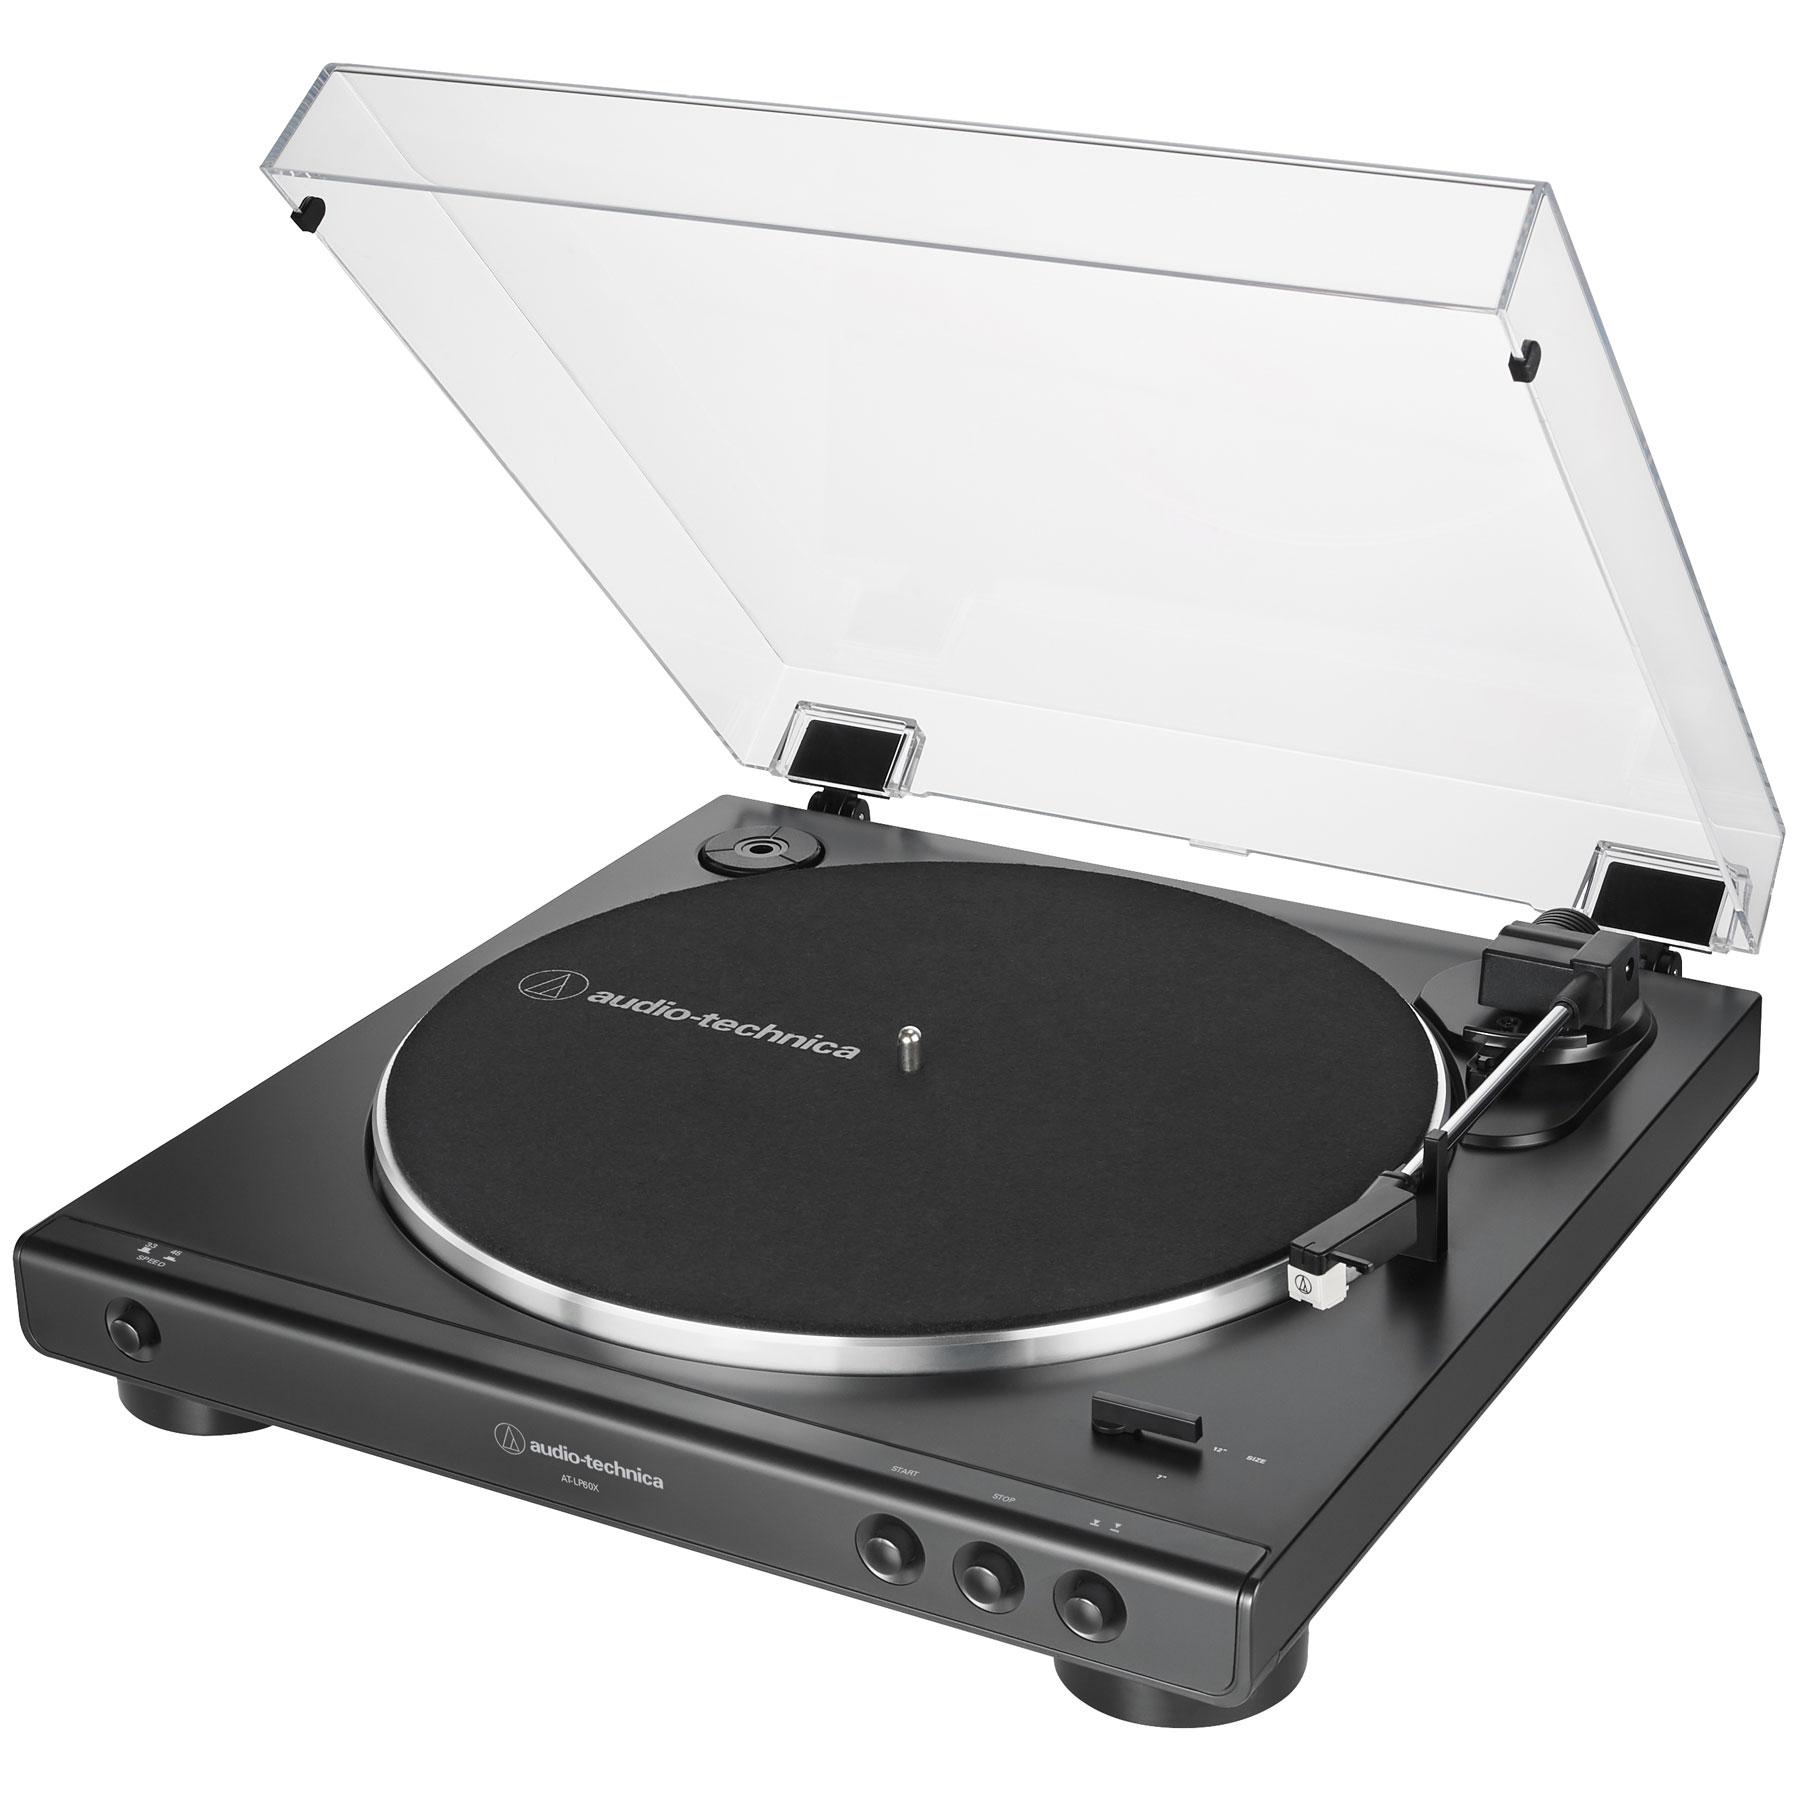 Audio technica AT-LP60x USB BT